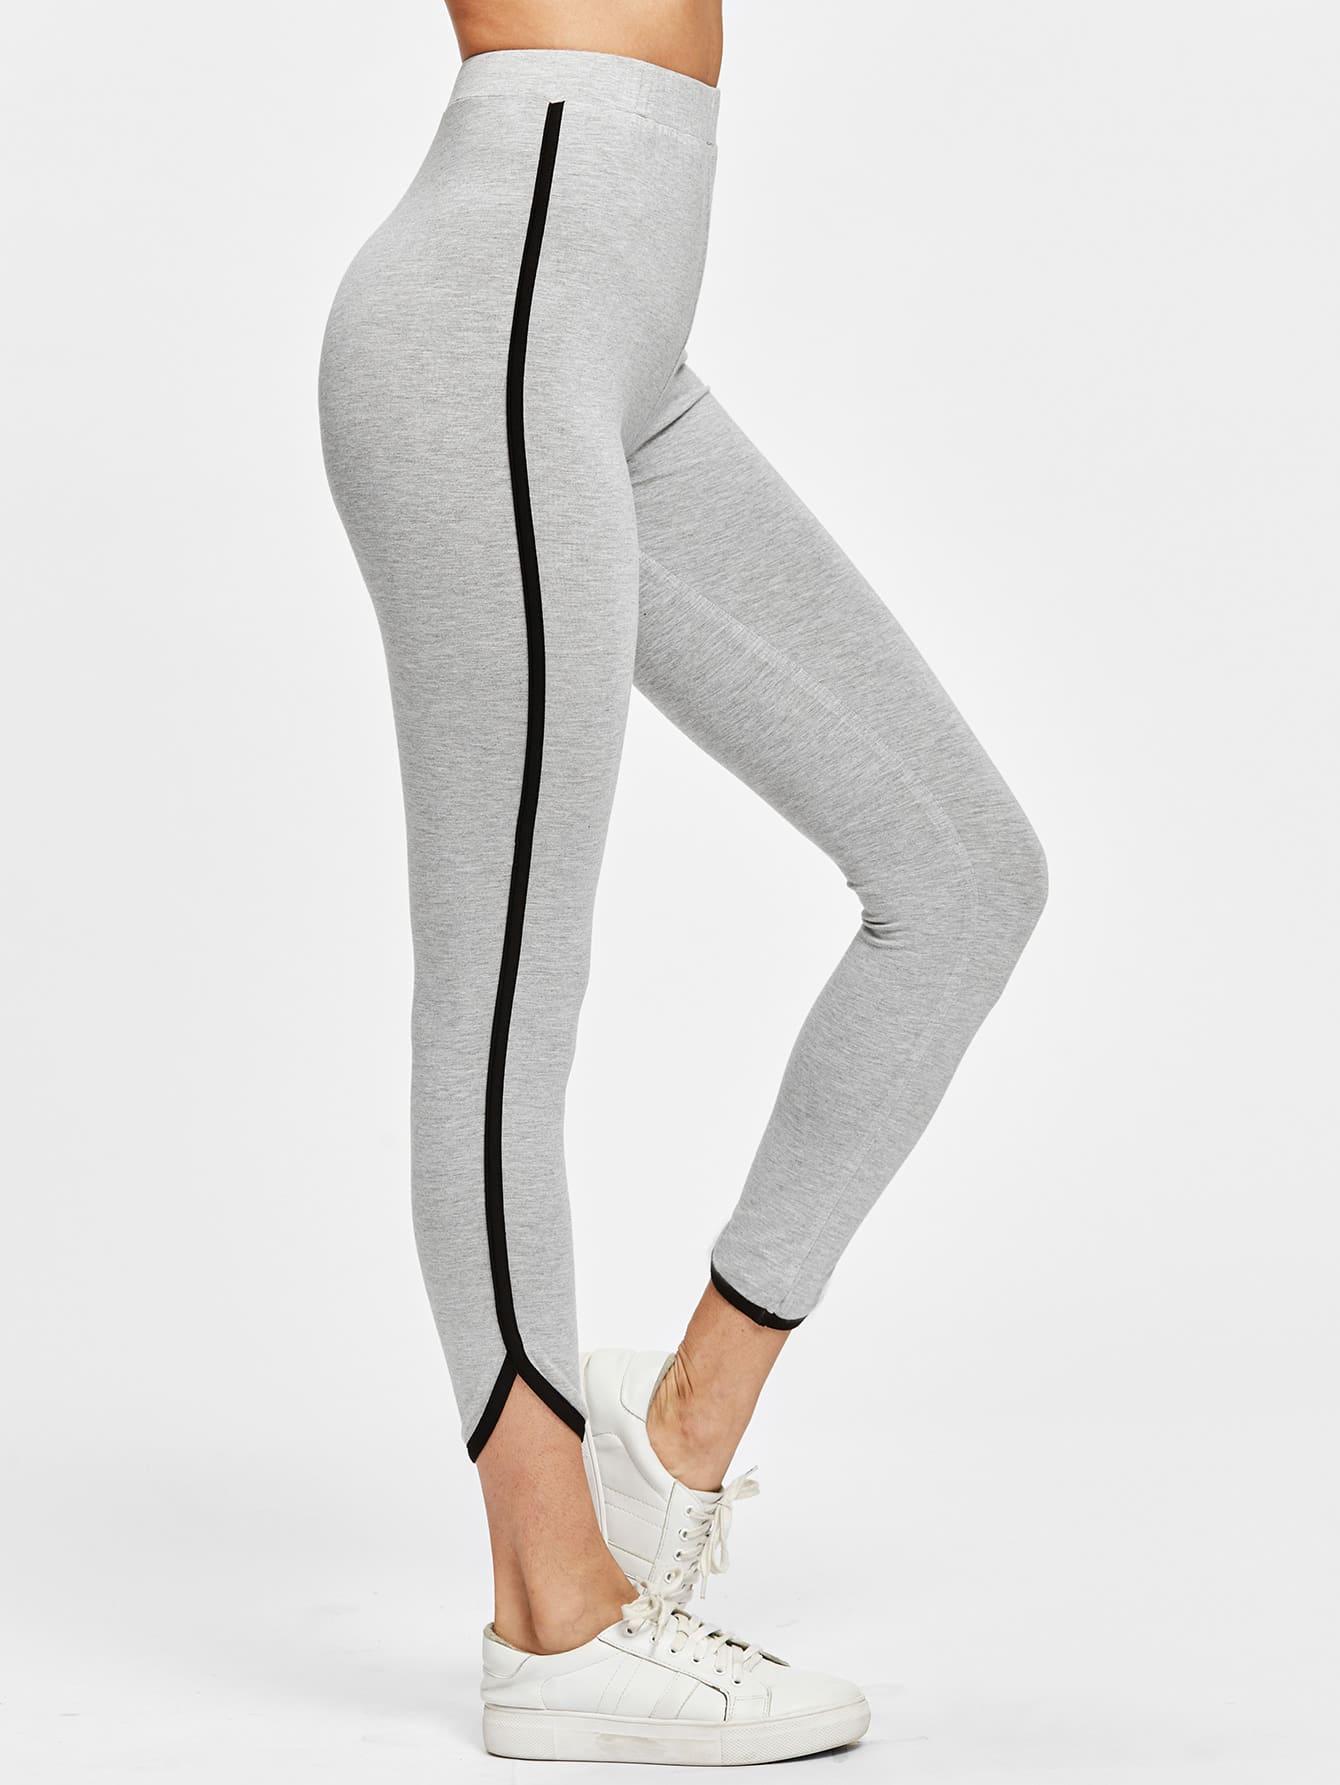 Contrast Binding Curved Hem Heather Knit Leggings все цены